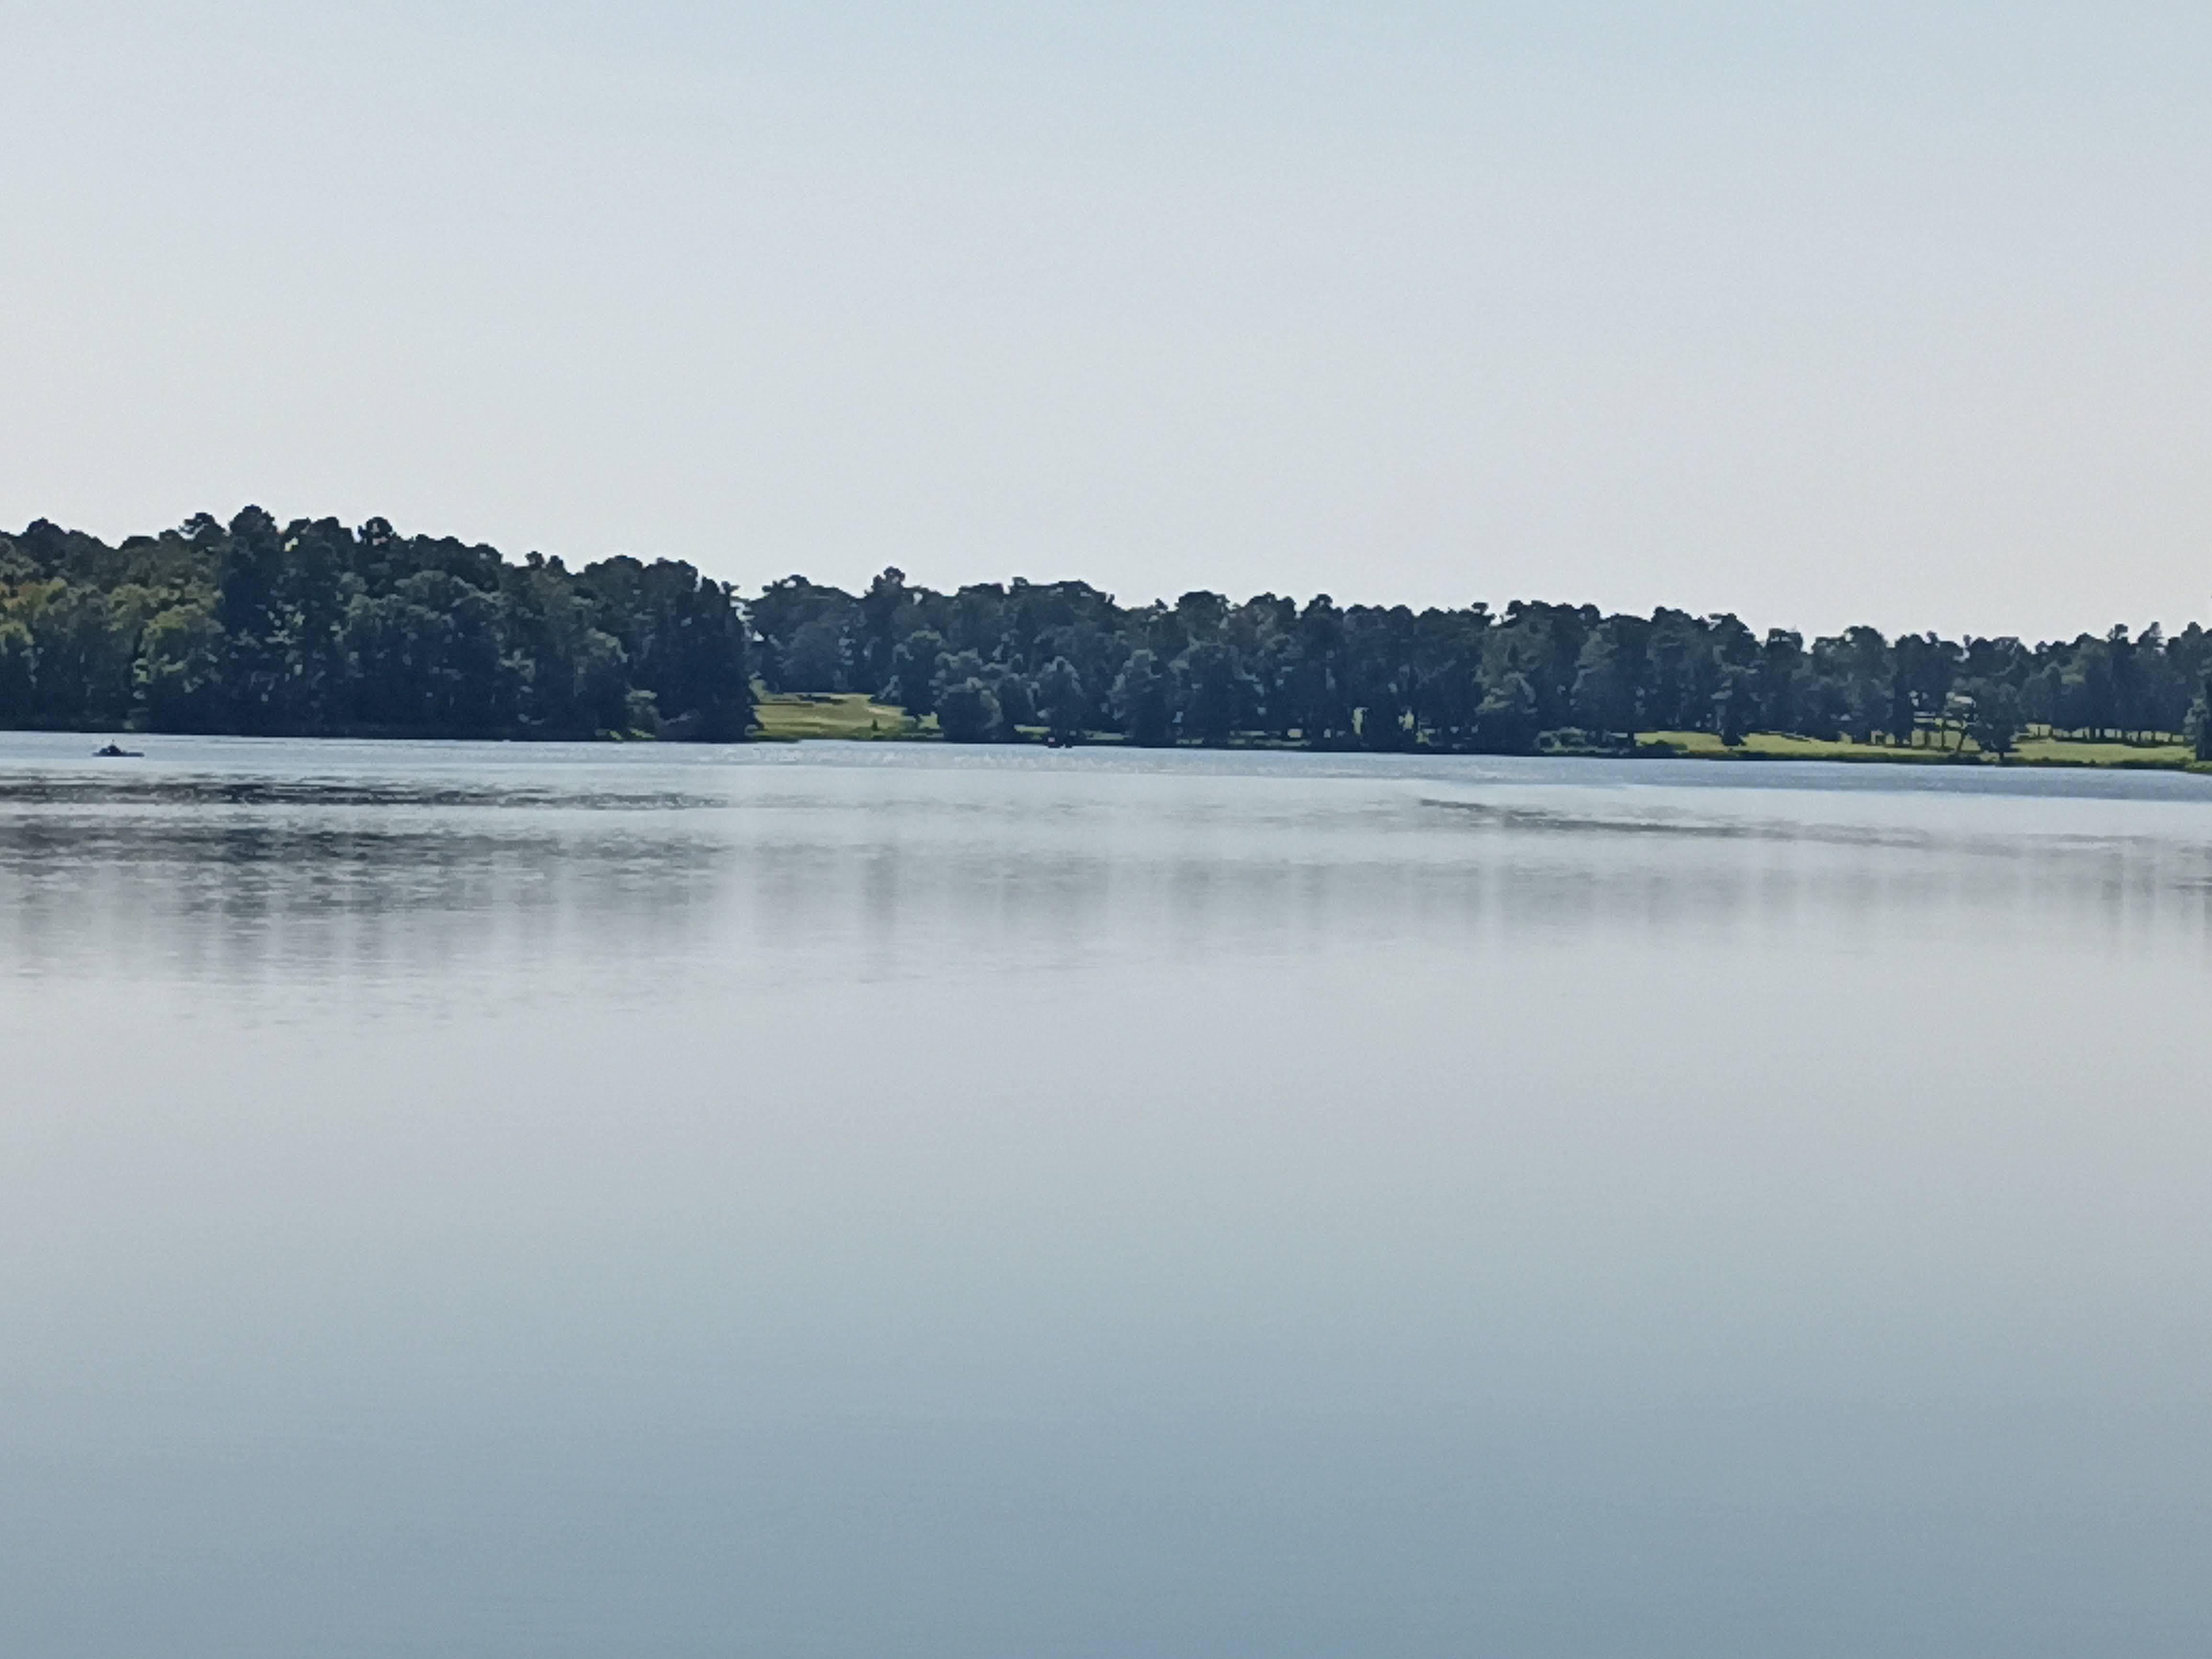 BLU g91 Pro photo sample: a landscape with a lake, 4x zoom